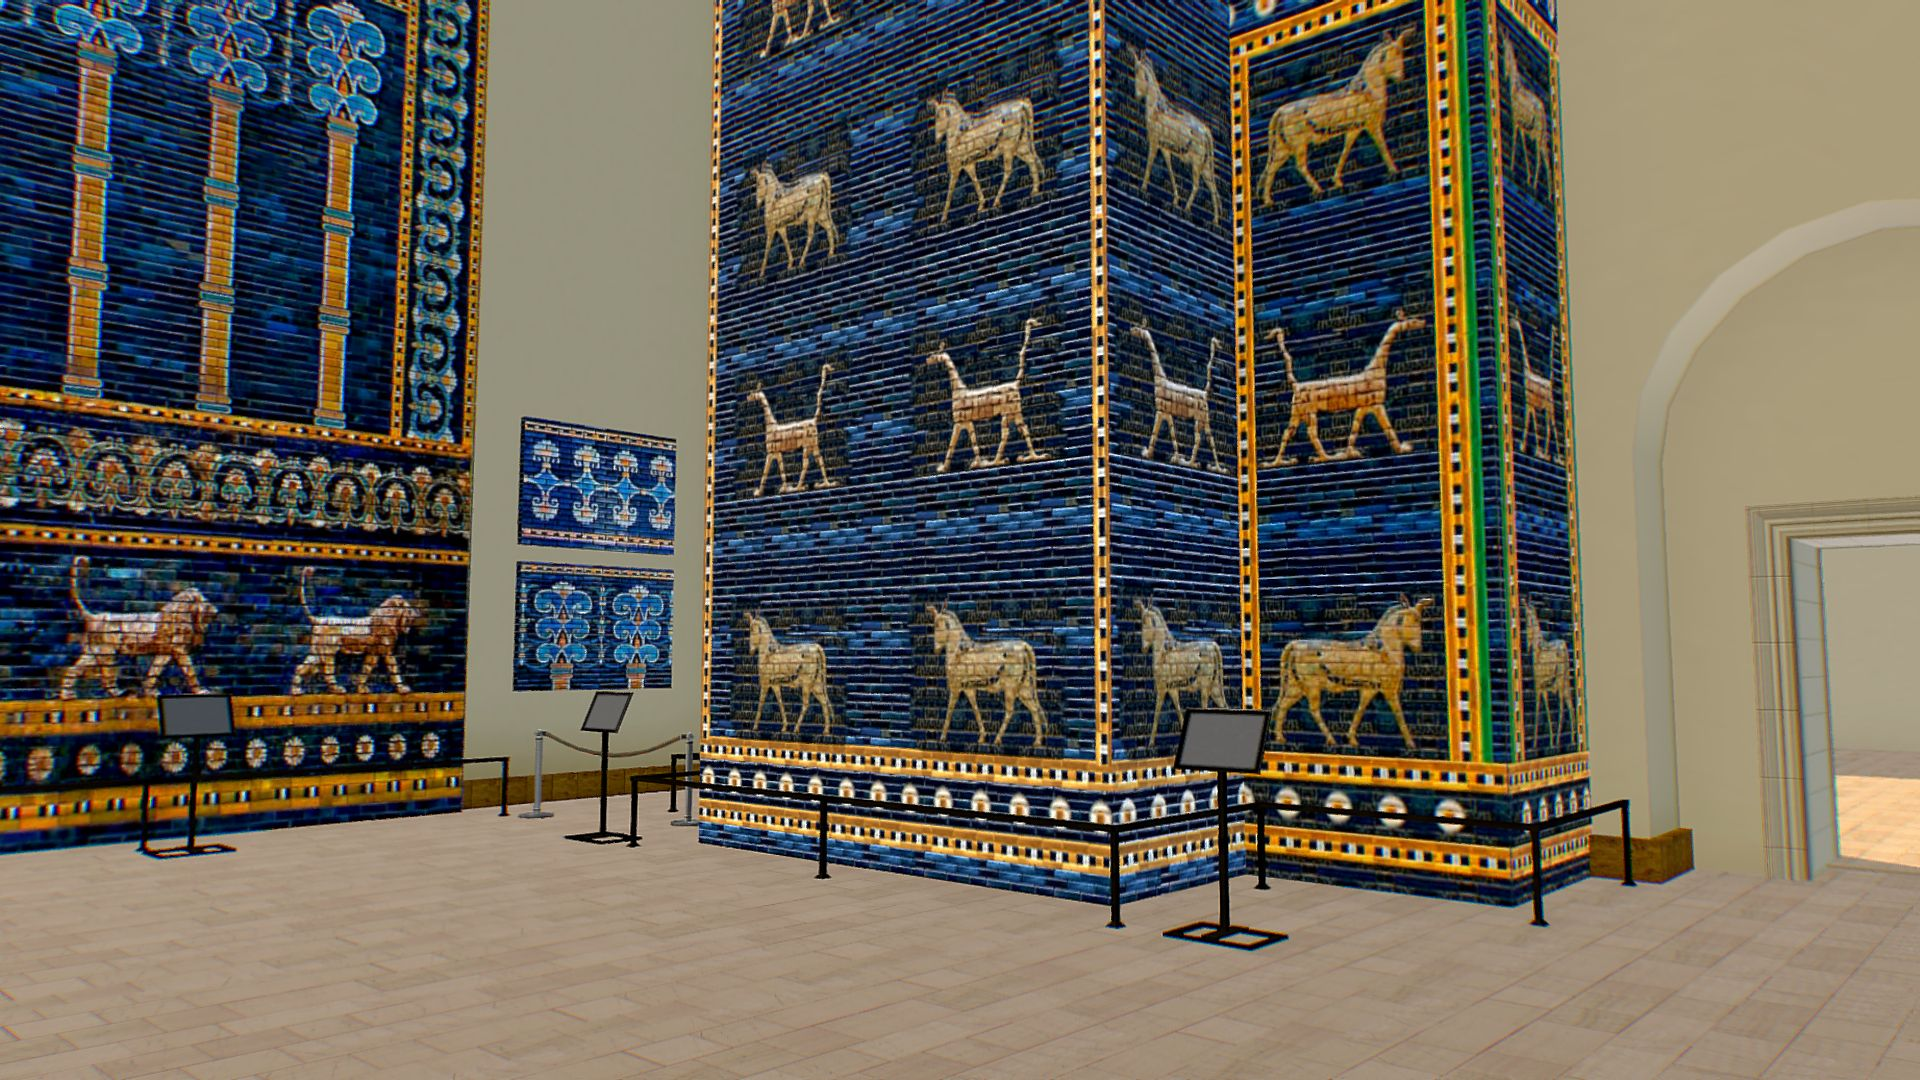 Pergamon Museum Babylon Mesopotamia Ishtar Gate Pergamon Museum Pergamon Ishtar